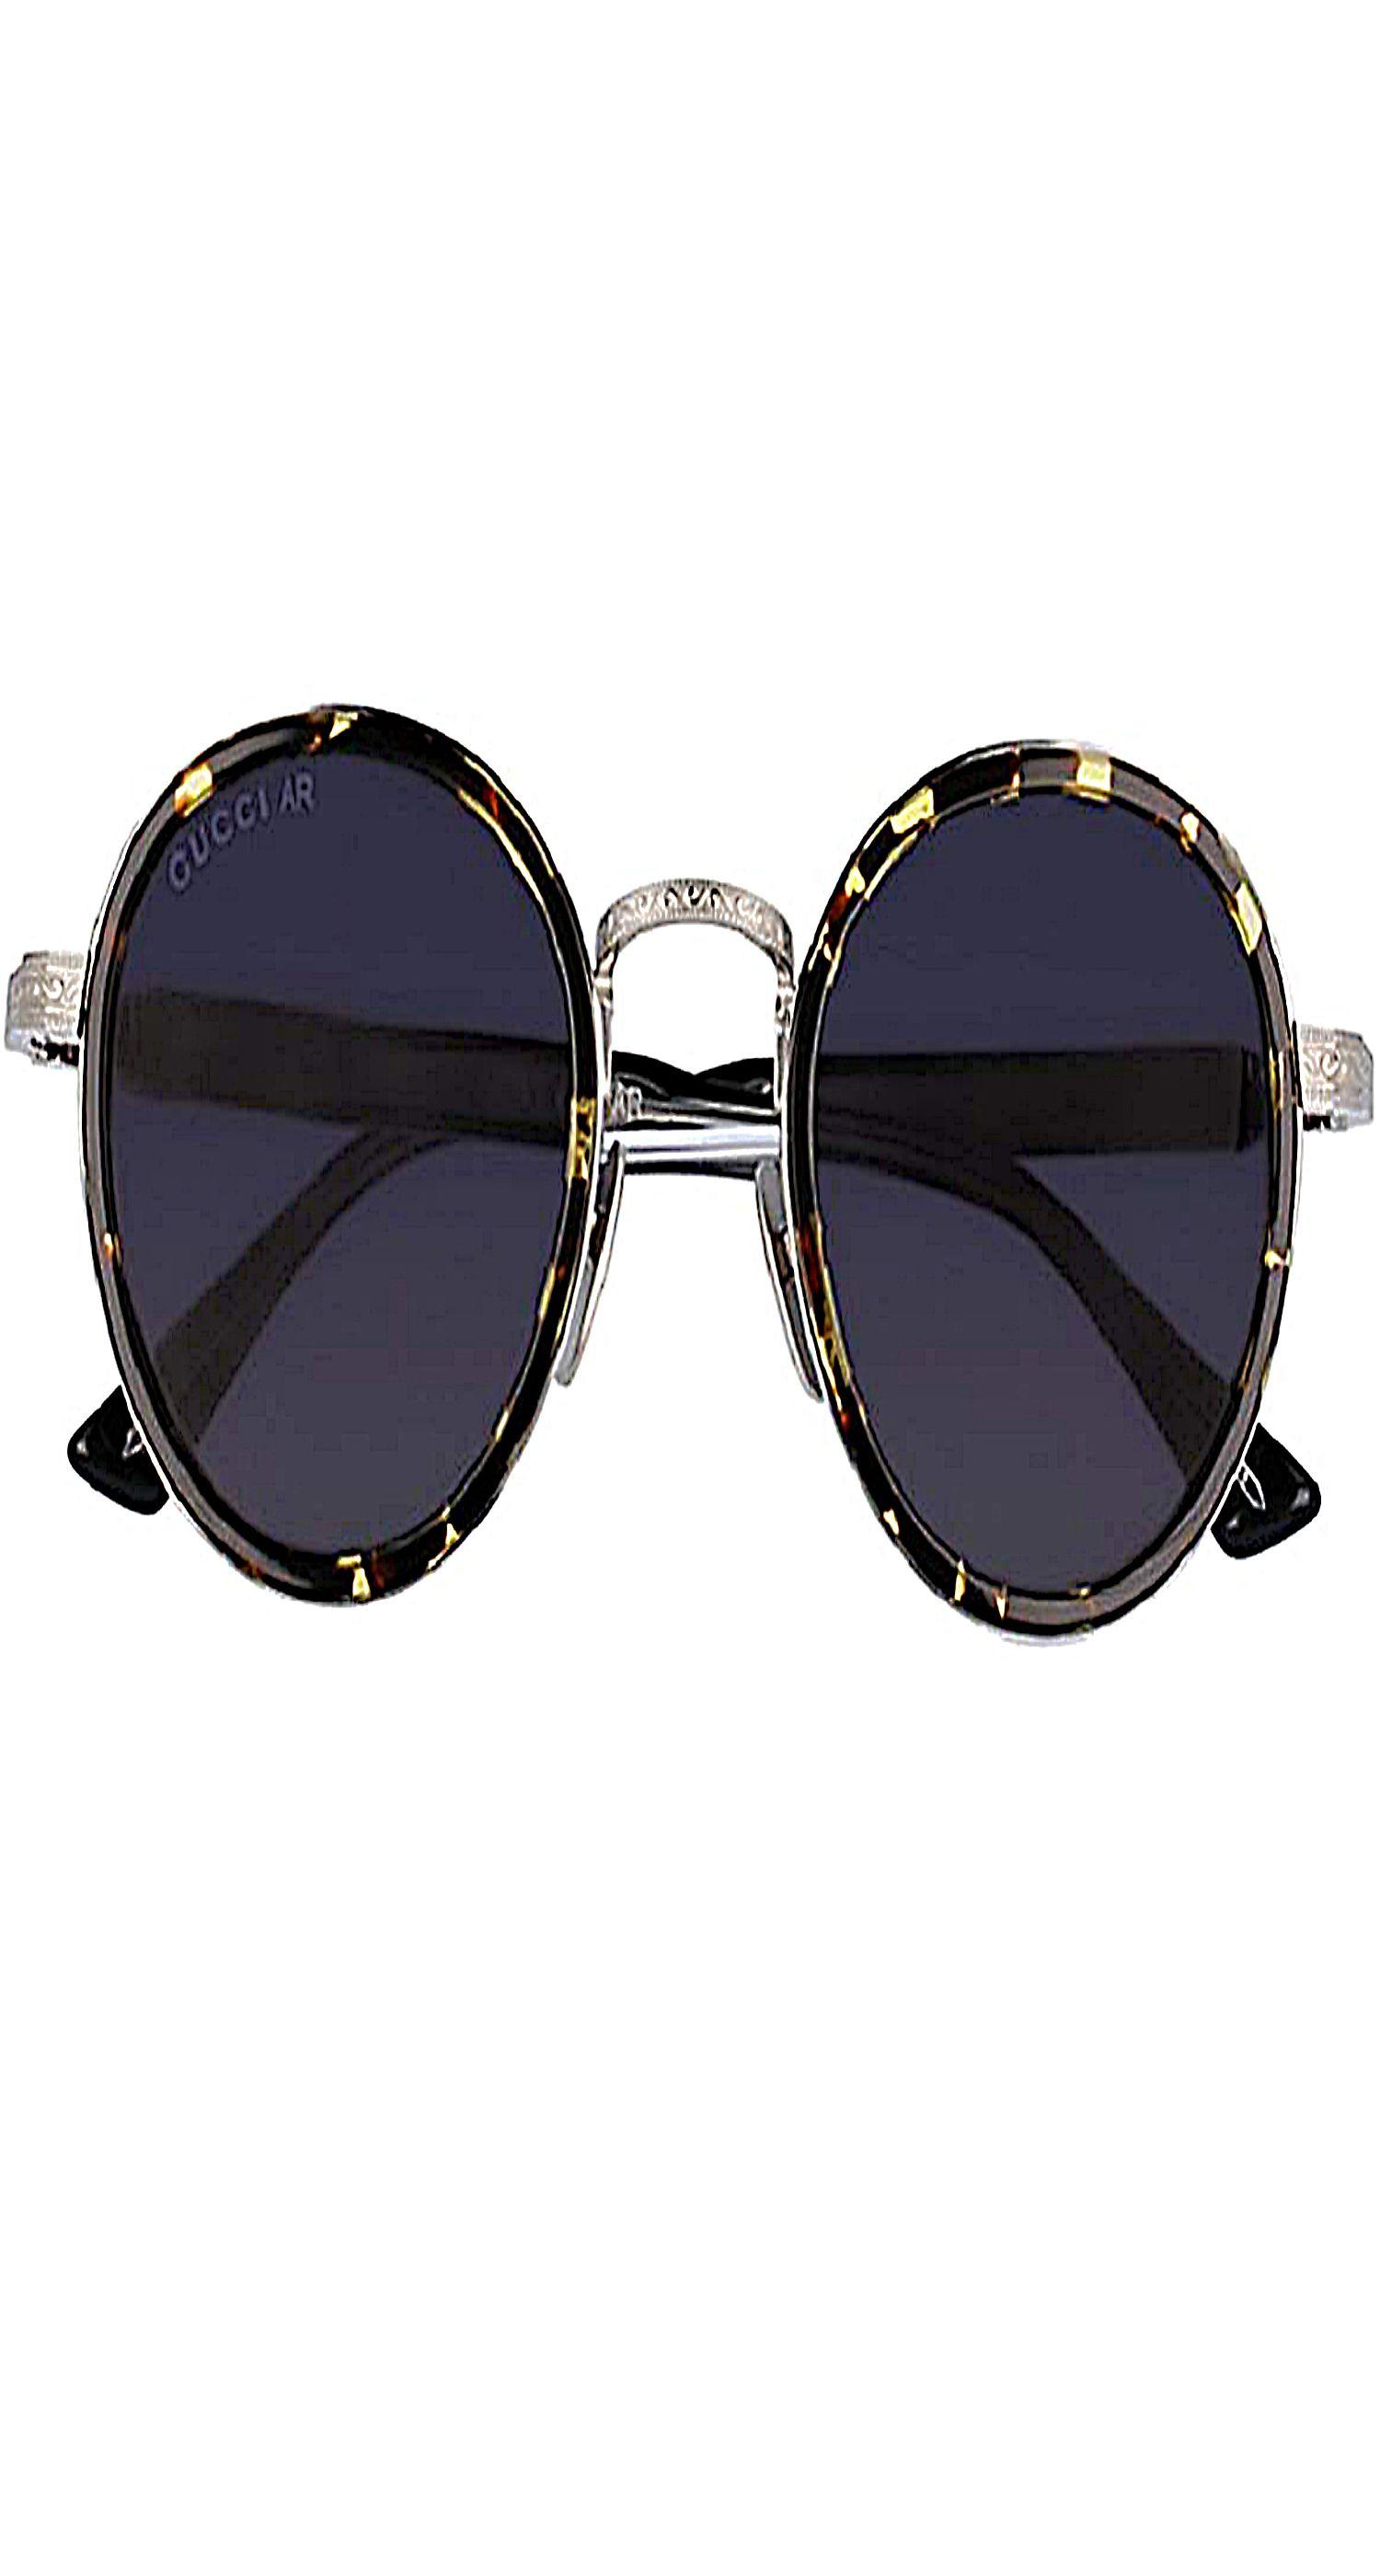 6551eaa34e8 Gucci Fashion GG0067S Sunglasses 002 Gold-Black   Grey Lens 48 mm mens  sunglasses